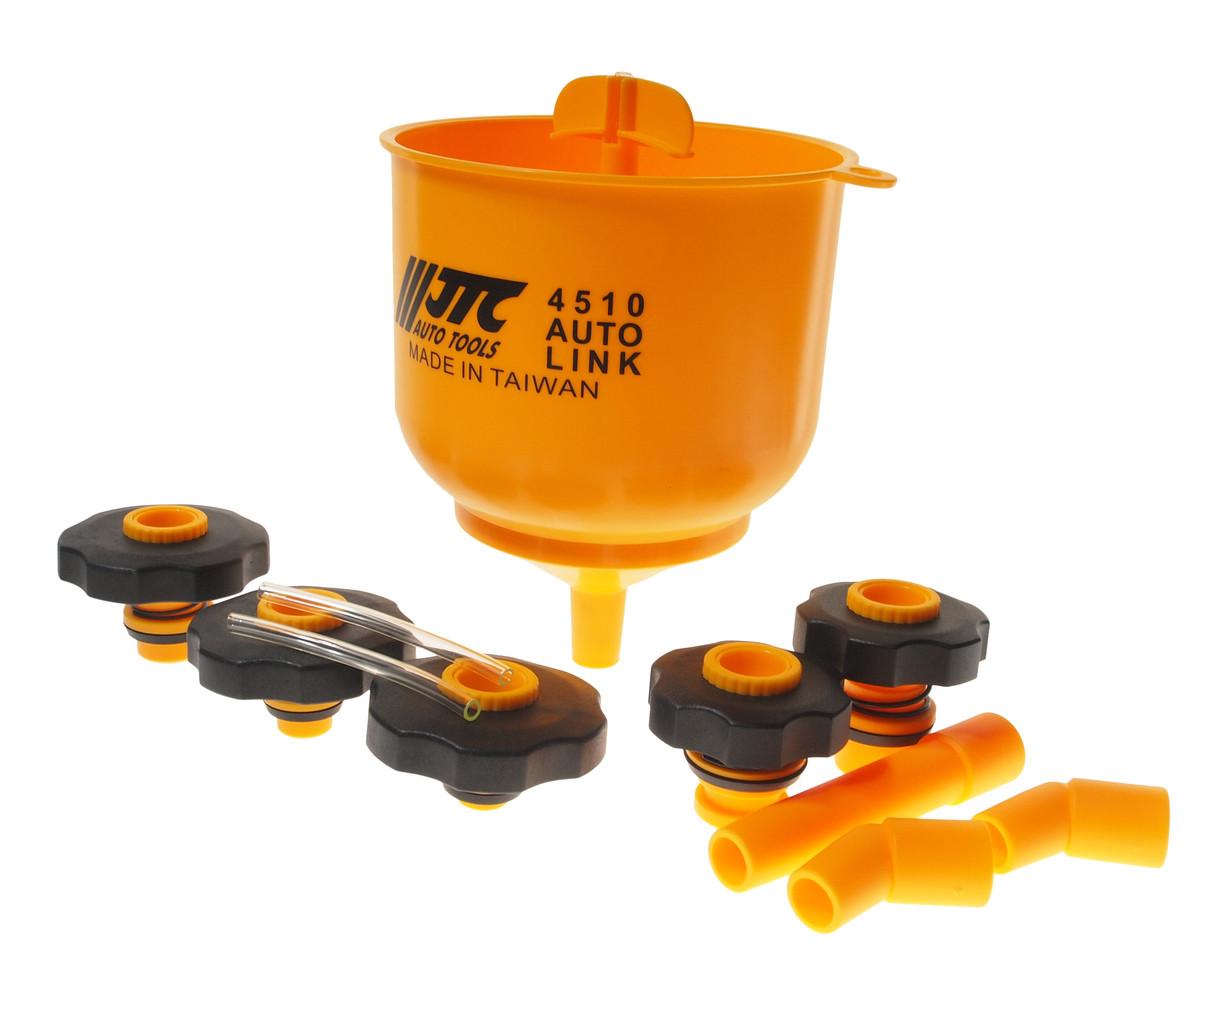 JTC Приспособление для заправки охлаждающей жидкости JTC